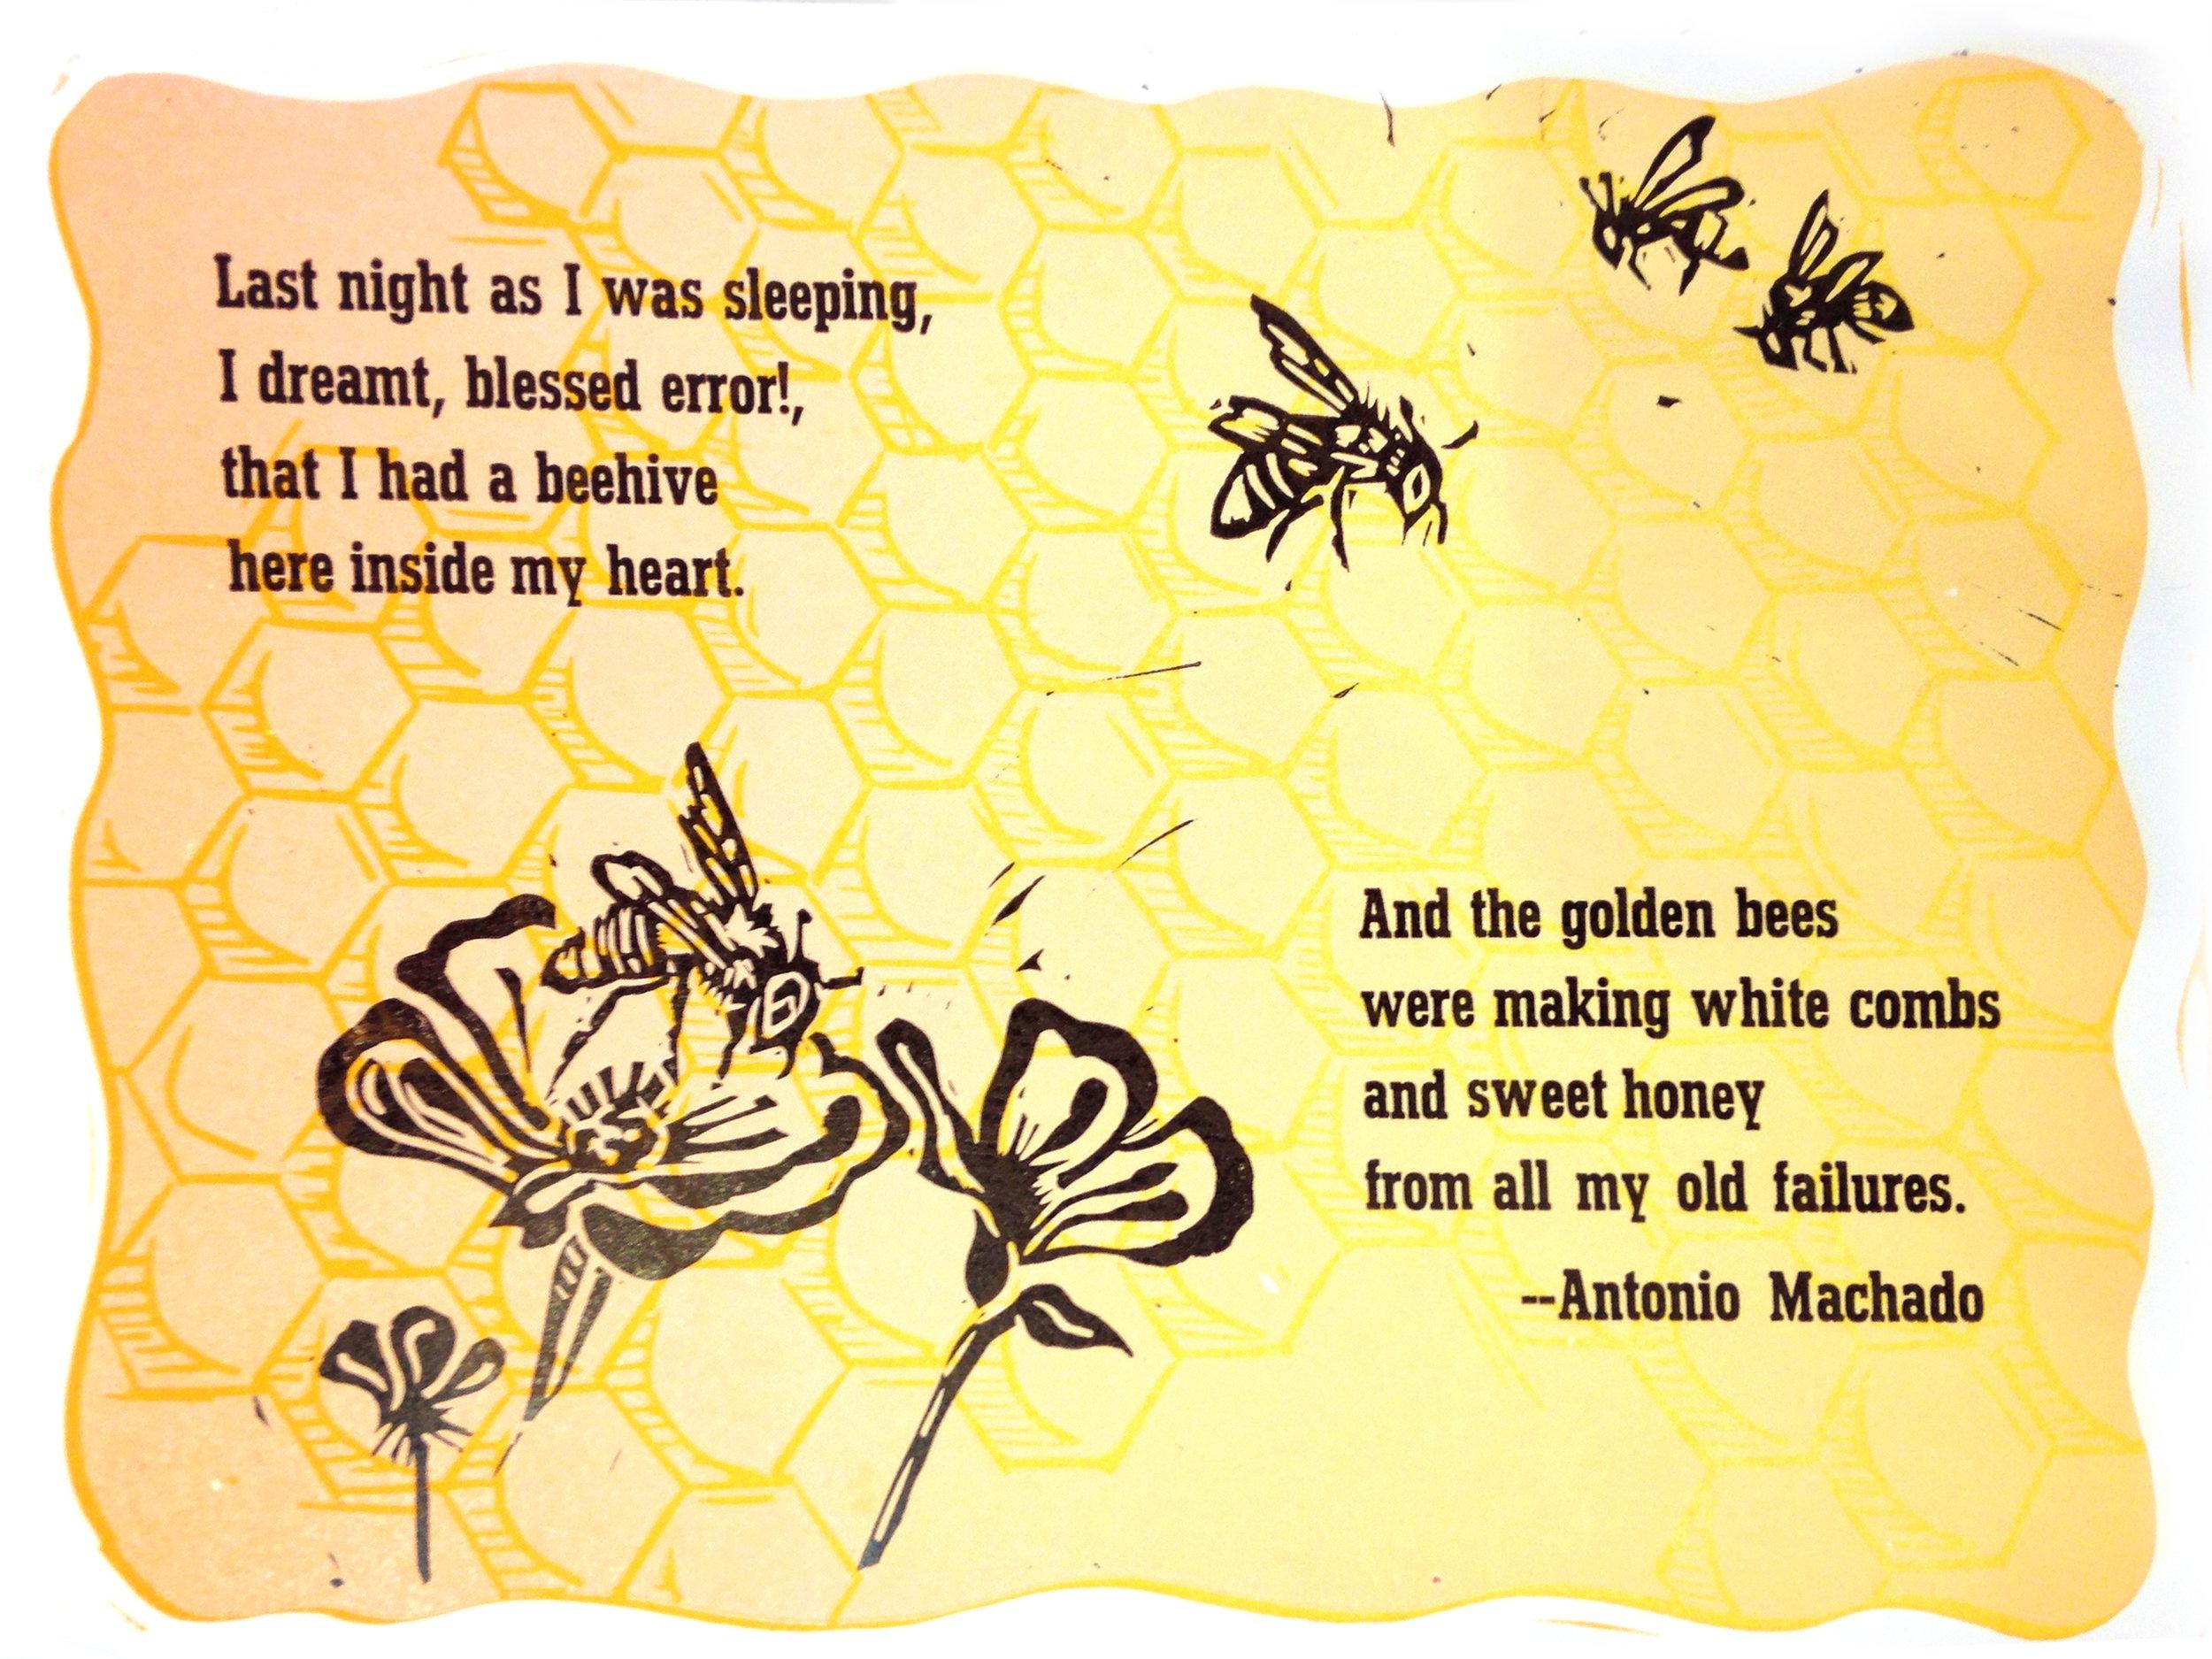 Machado Poem